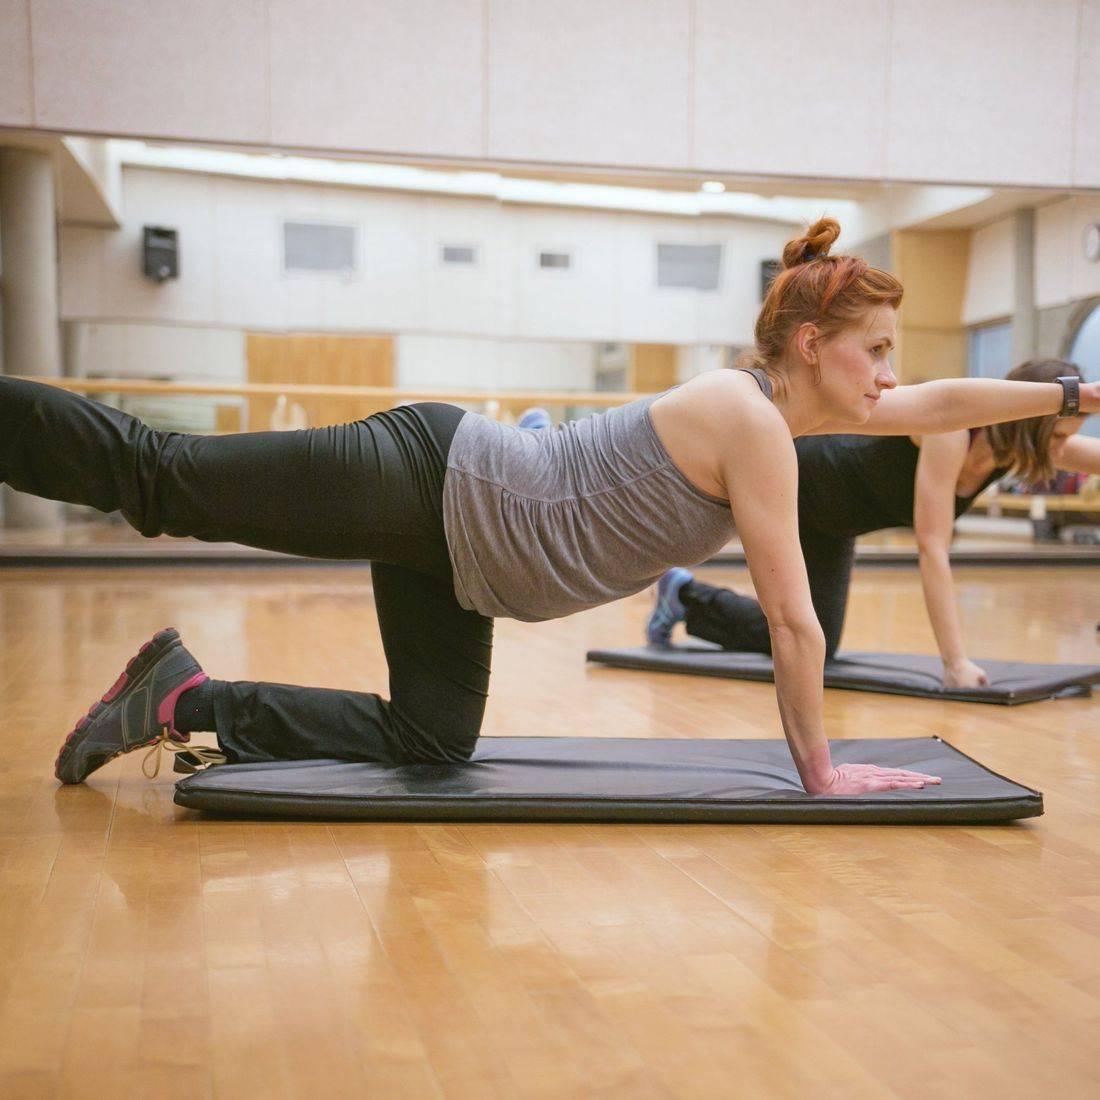 Prenatal, Prenatal Fitness, Prenatal Yoga, Prenatal Exercise, Prenatal Workout